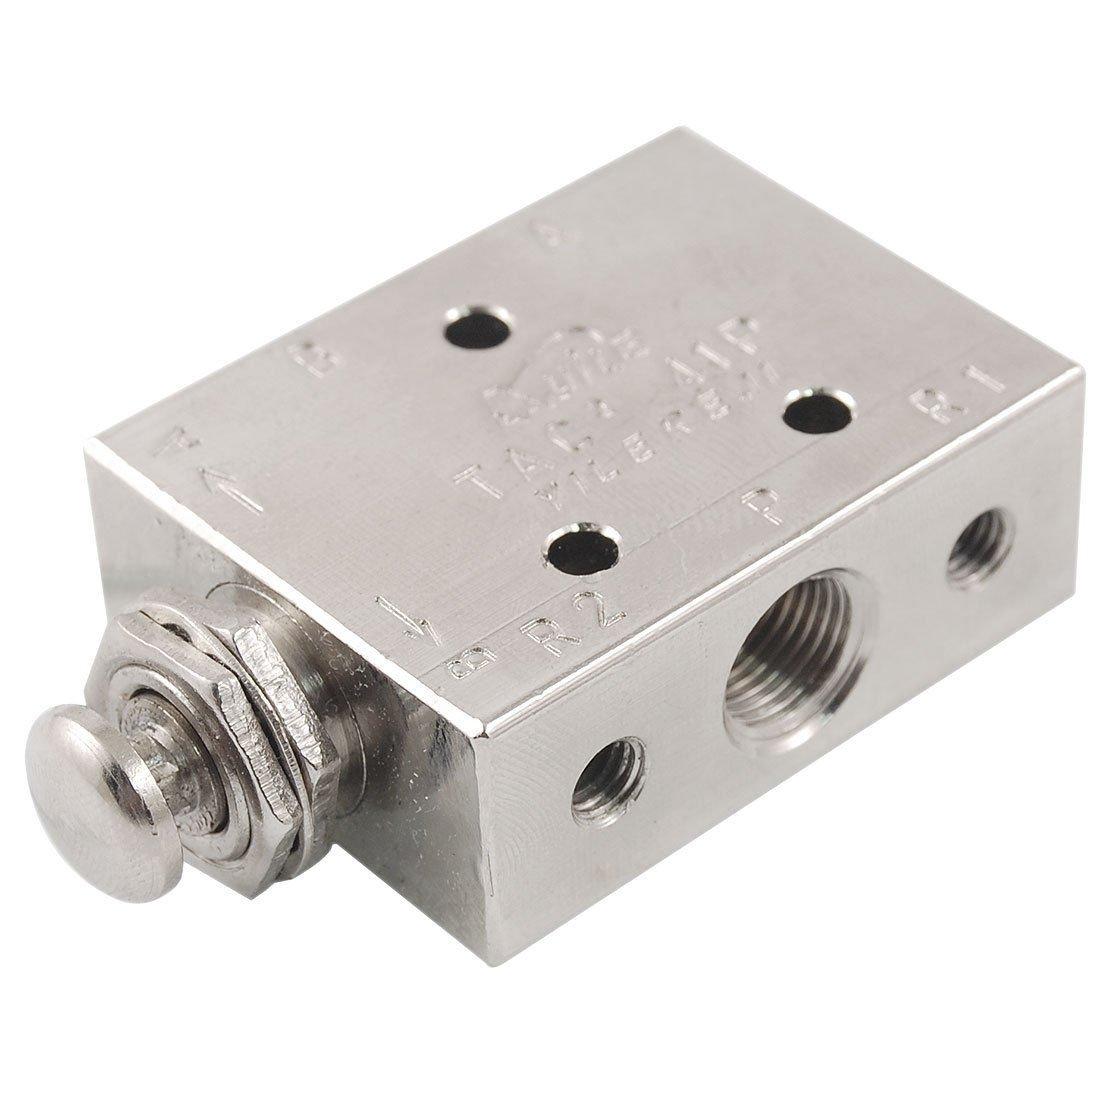 Pneumatic 2 Position 3 Way Spring Return Button Air Valve TAC2-41P